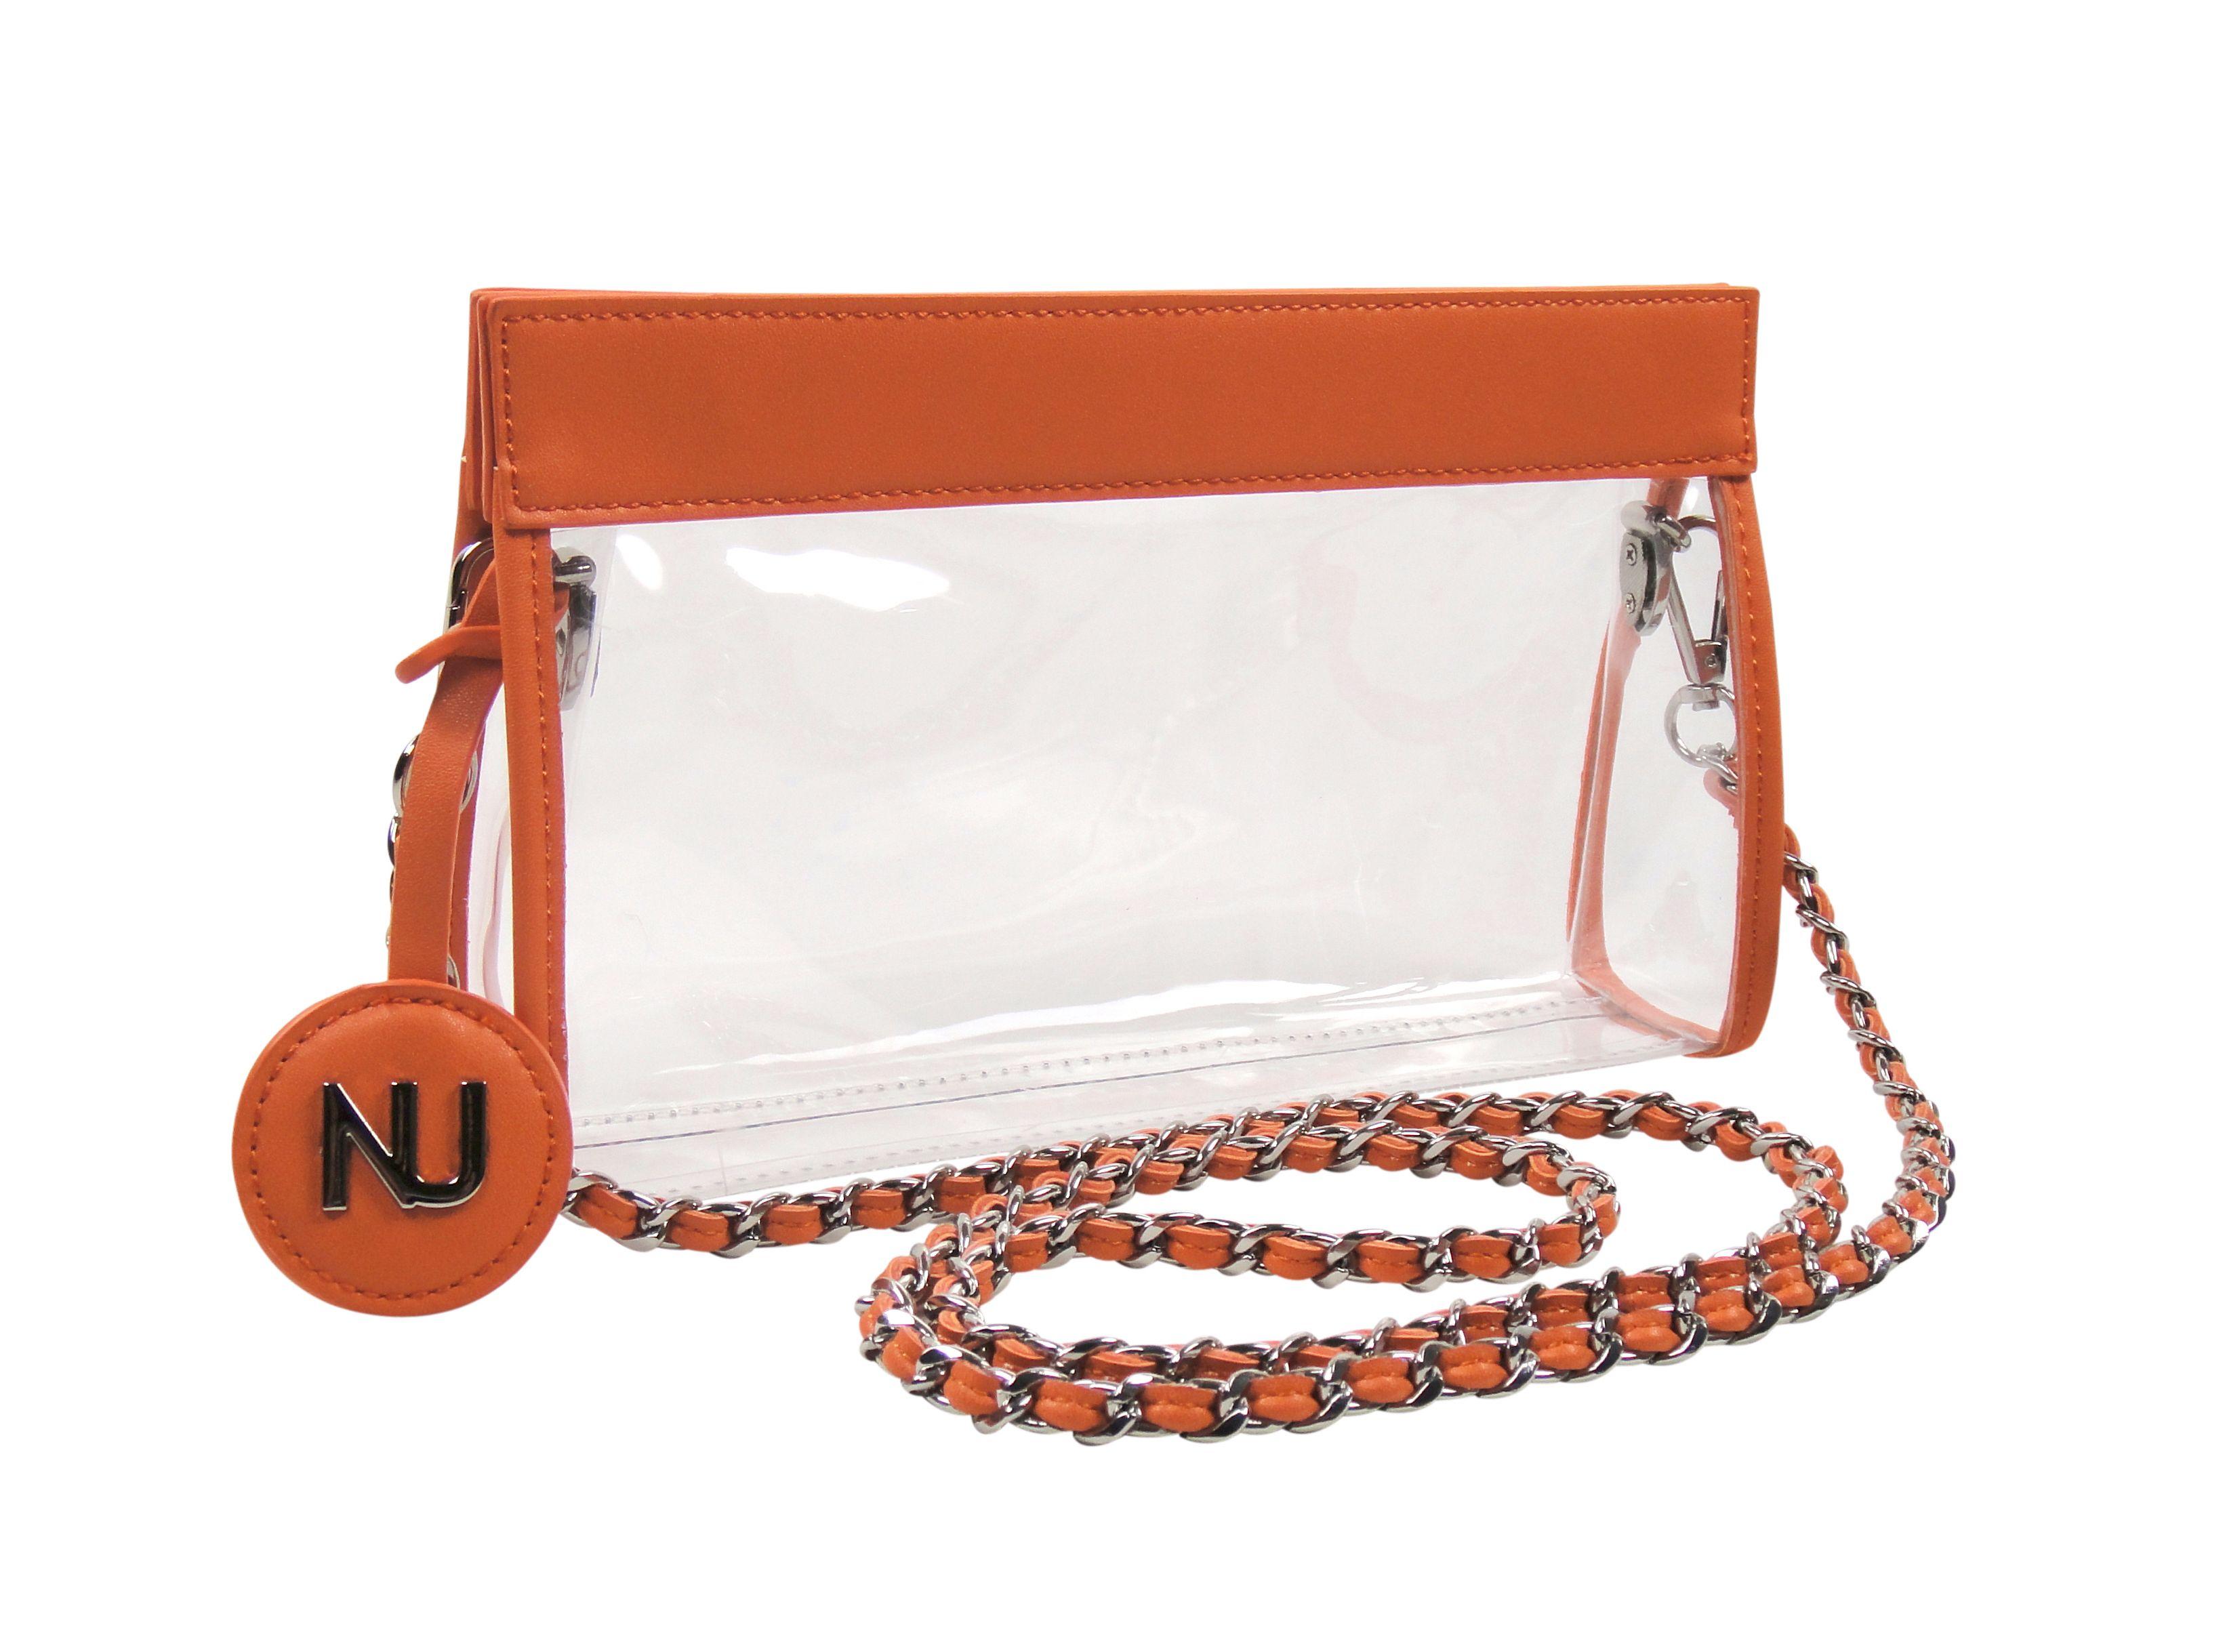 ca2969d282b4 Clear Handbag Purse /Clear Stadium Purse / NU Women Handbags / Clear ...